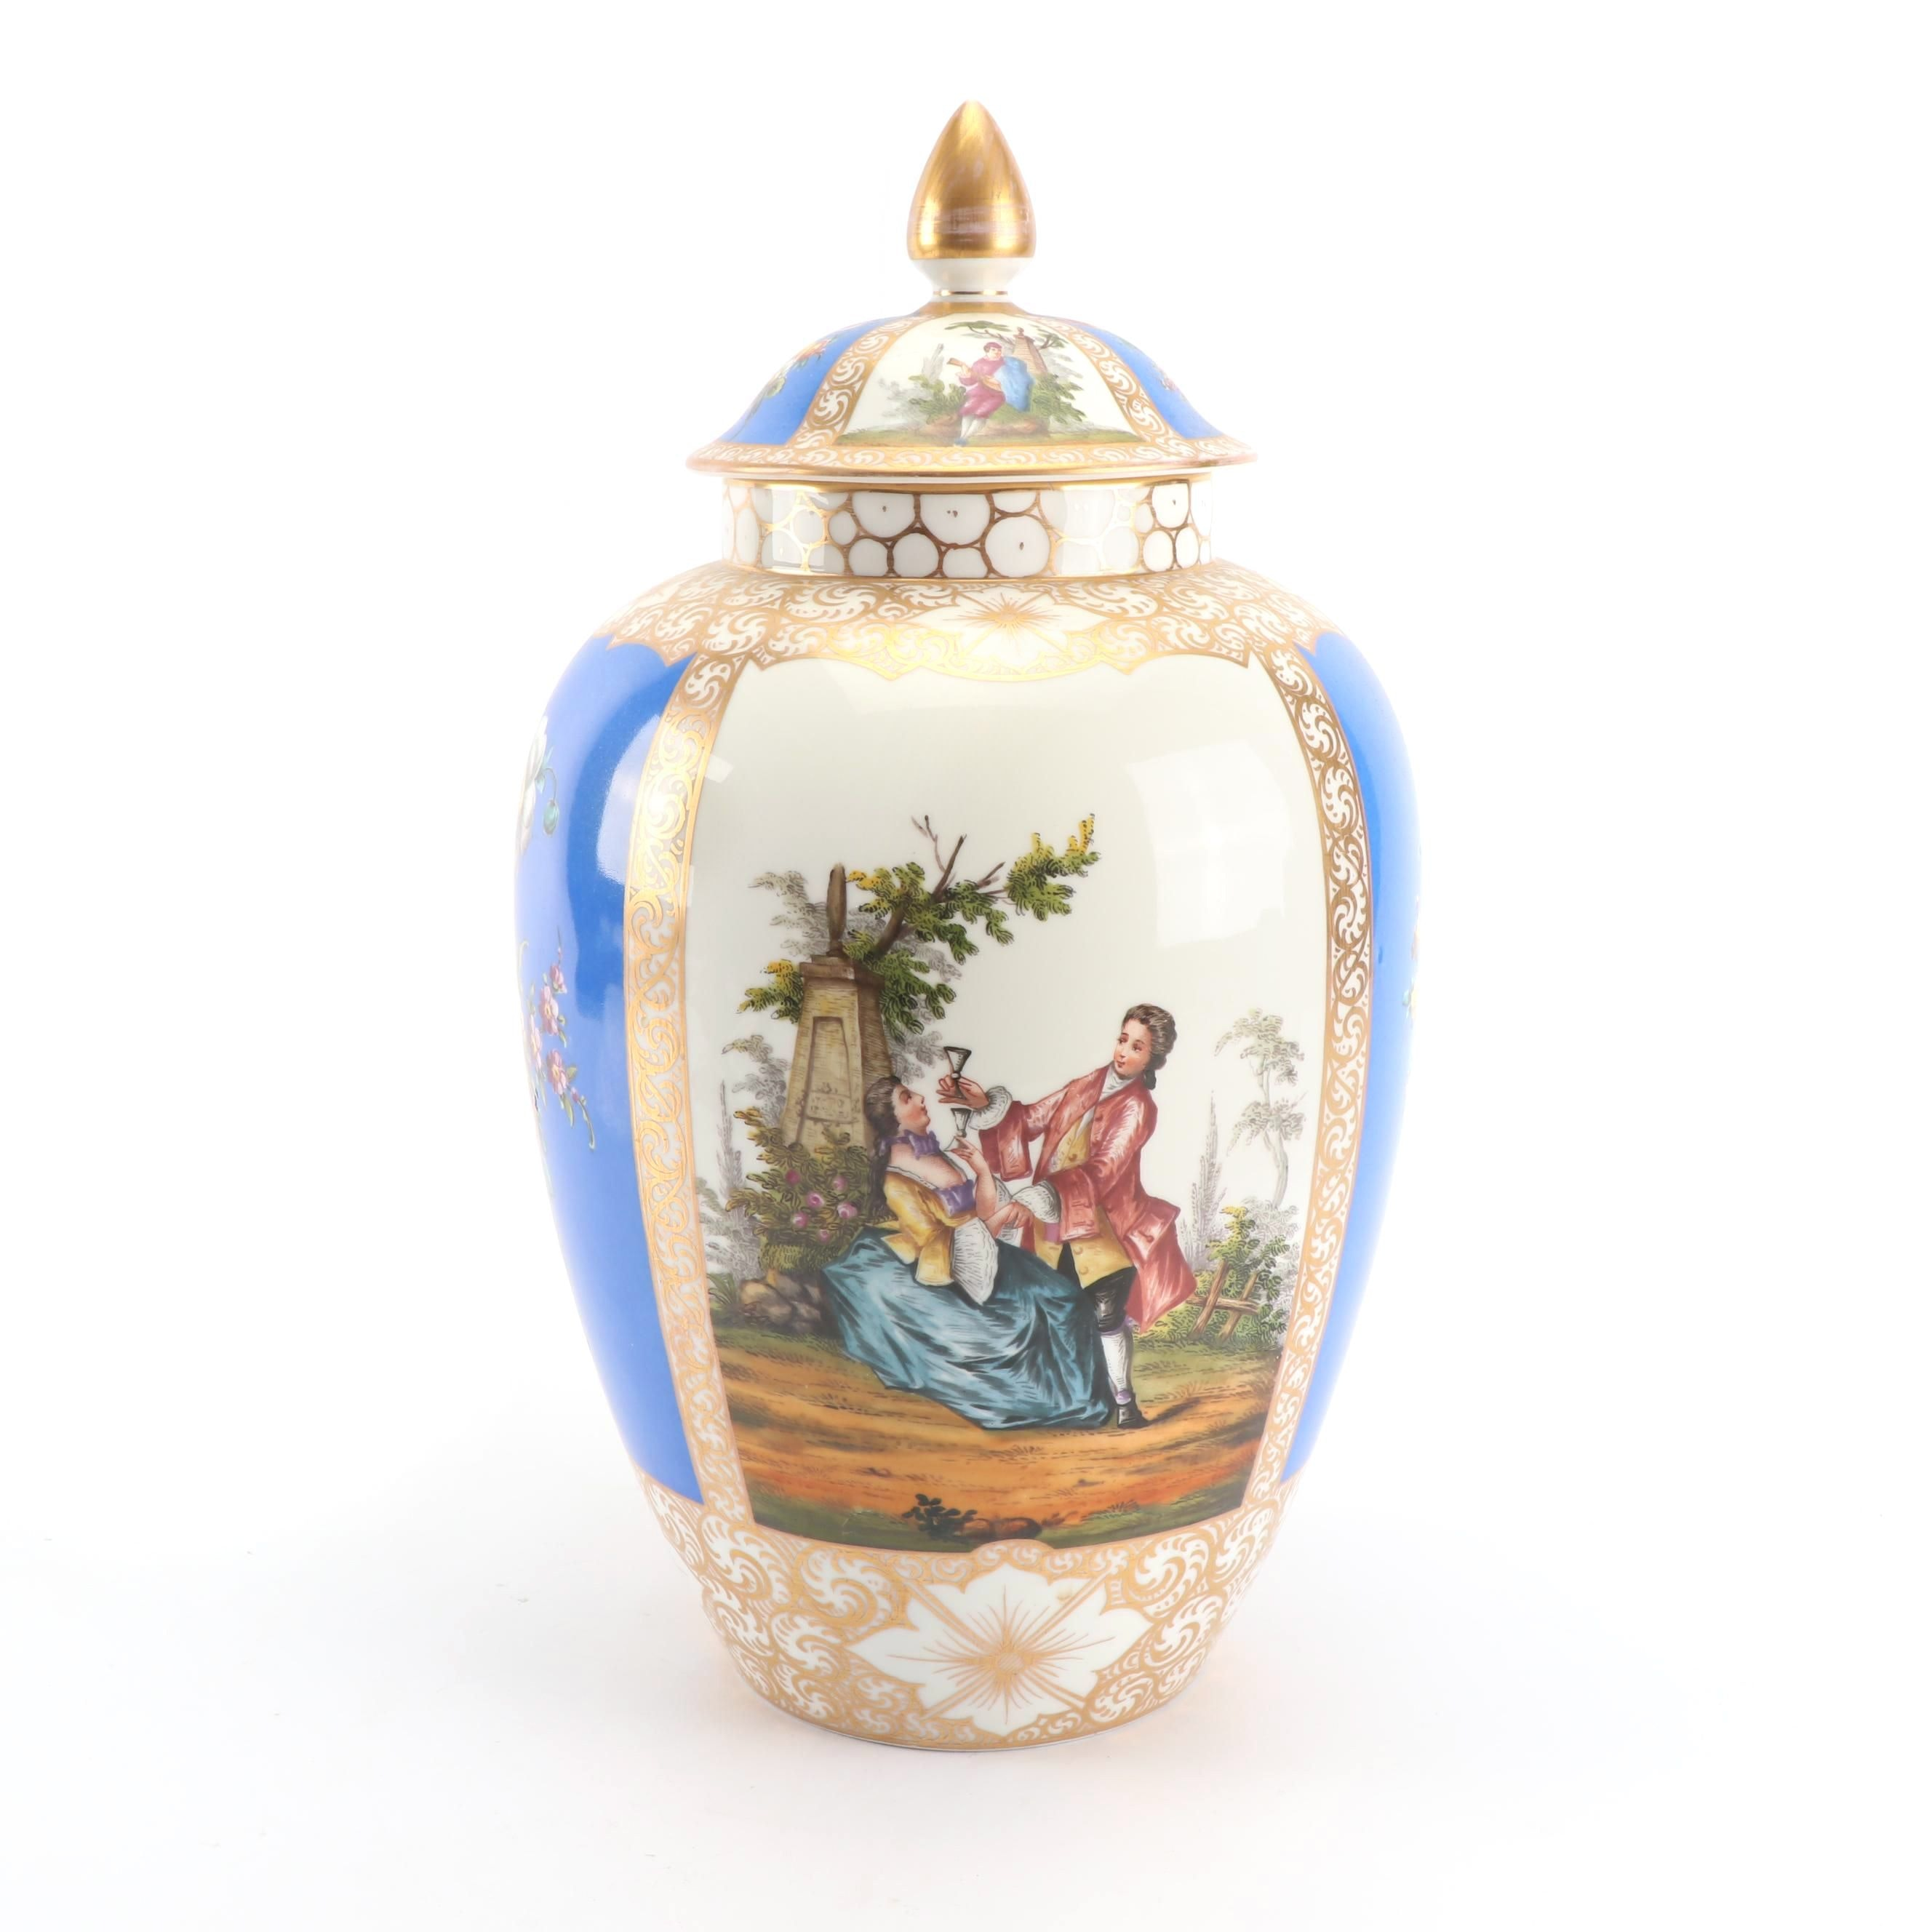 Helena Wolfsohn Hand-Painted Porcelain Lidded Jar